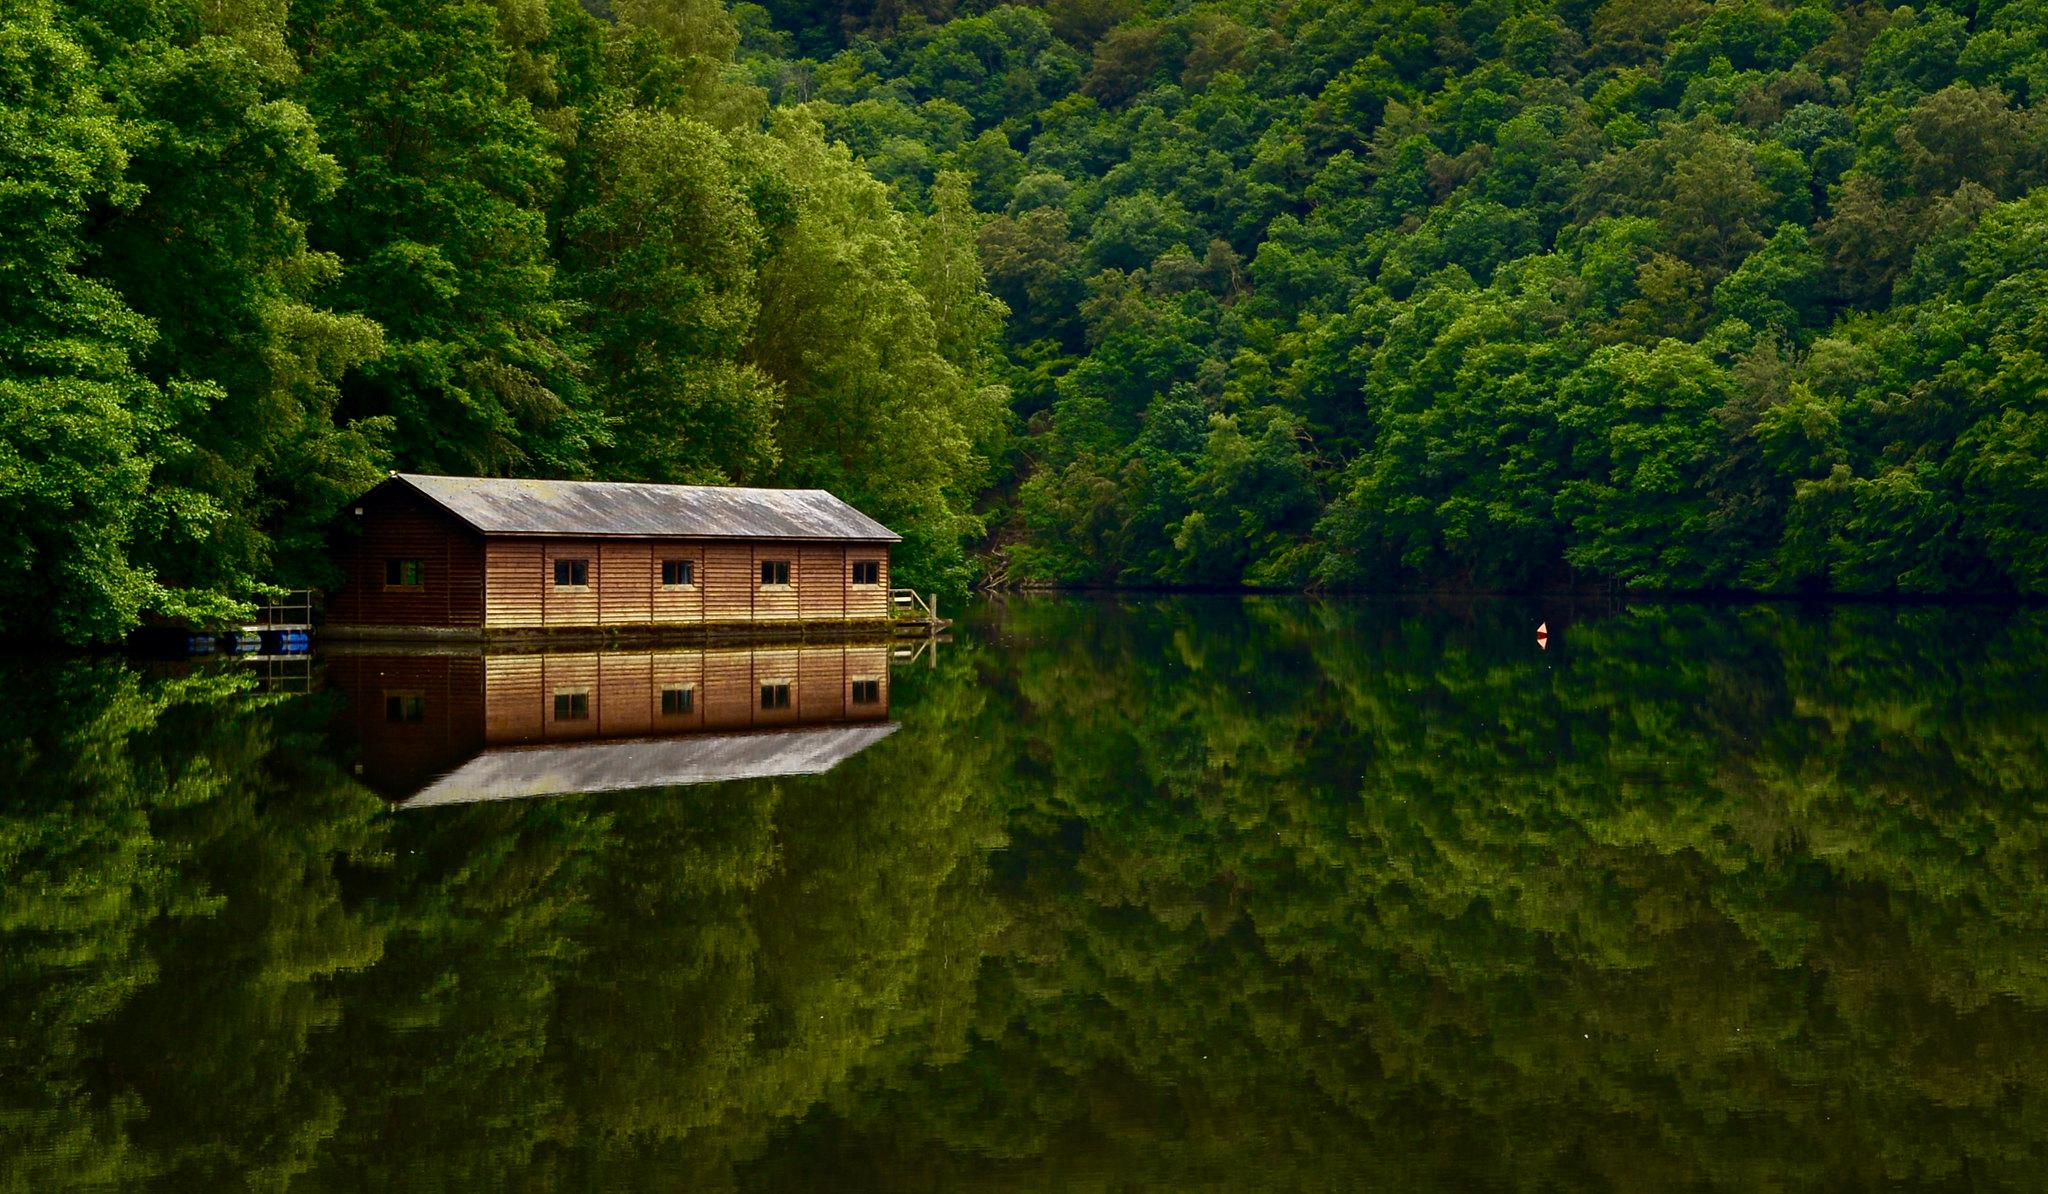 Lac de Nisramont - Canada - Flickr - Hubert Dieu